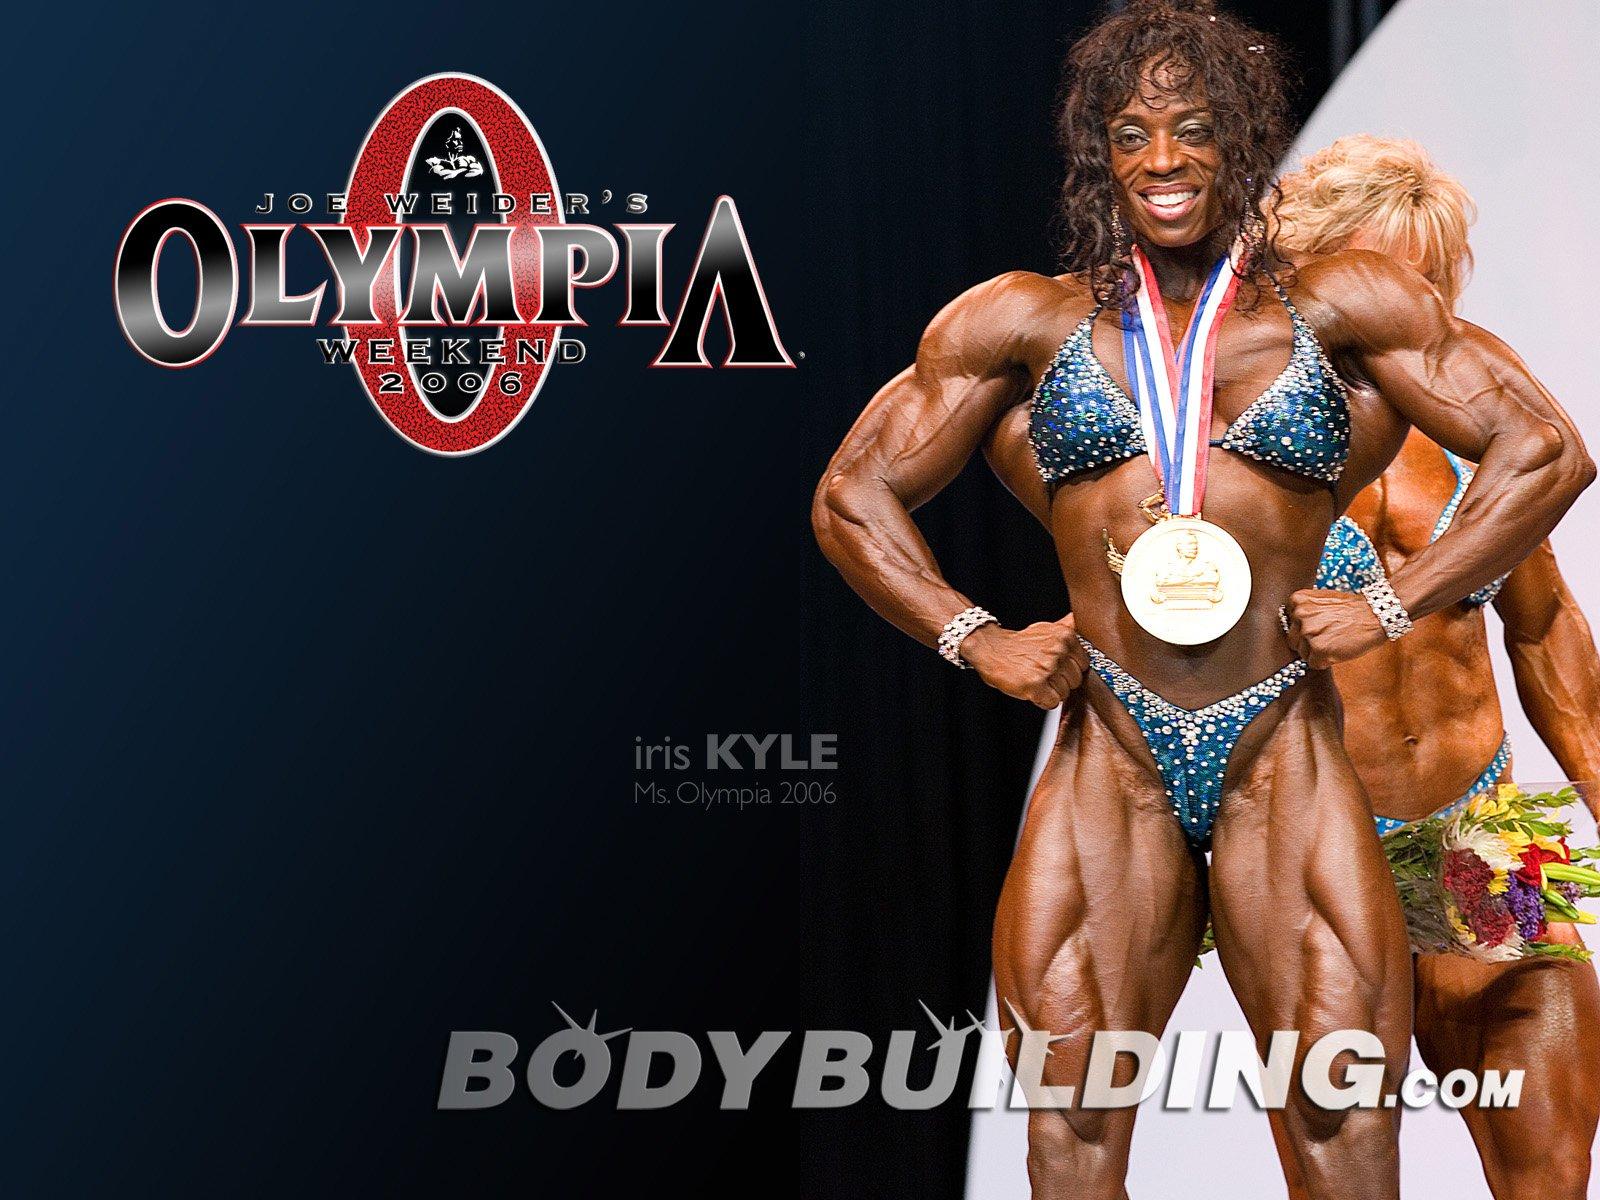 Фото Бодибилдинг  2006 Ms Olympia  Bodybuilding Foto.